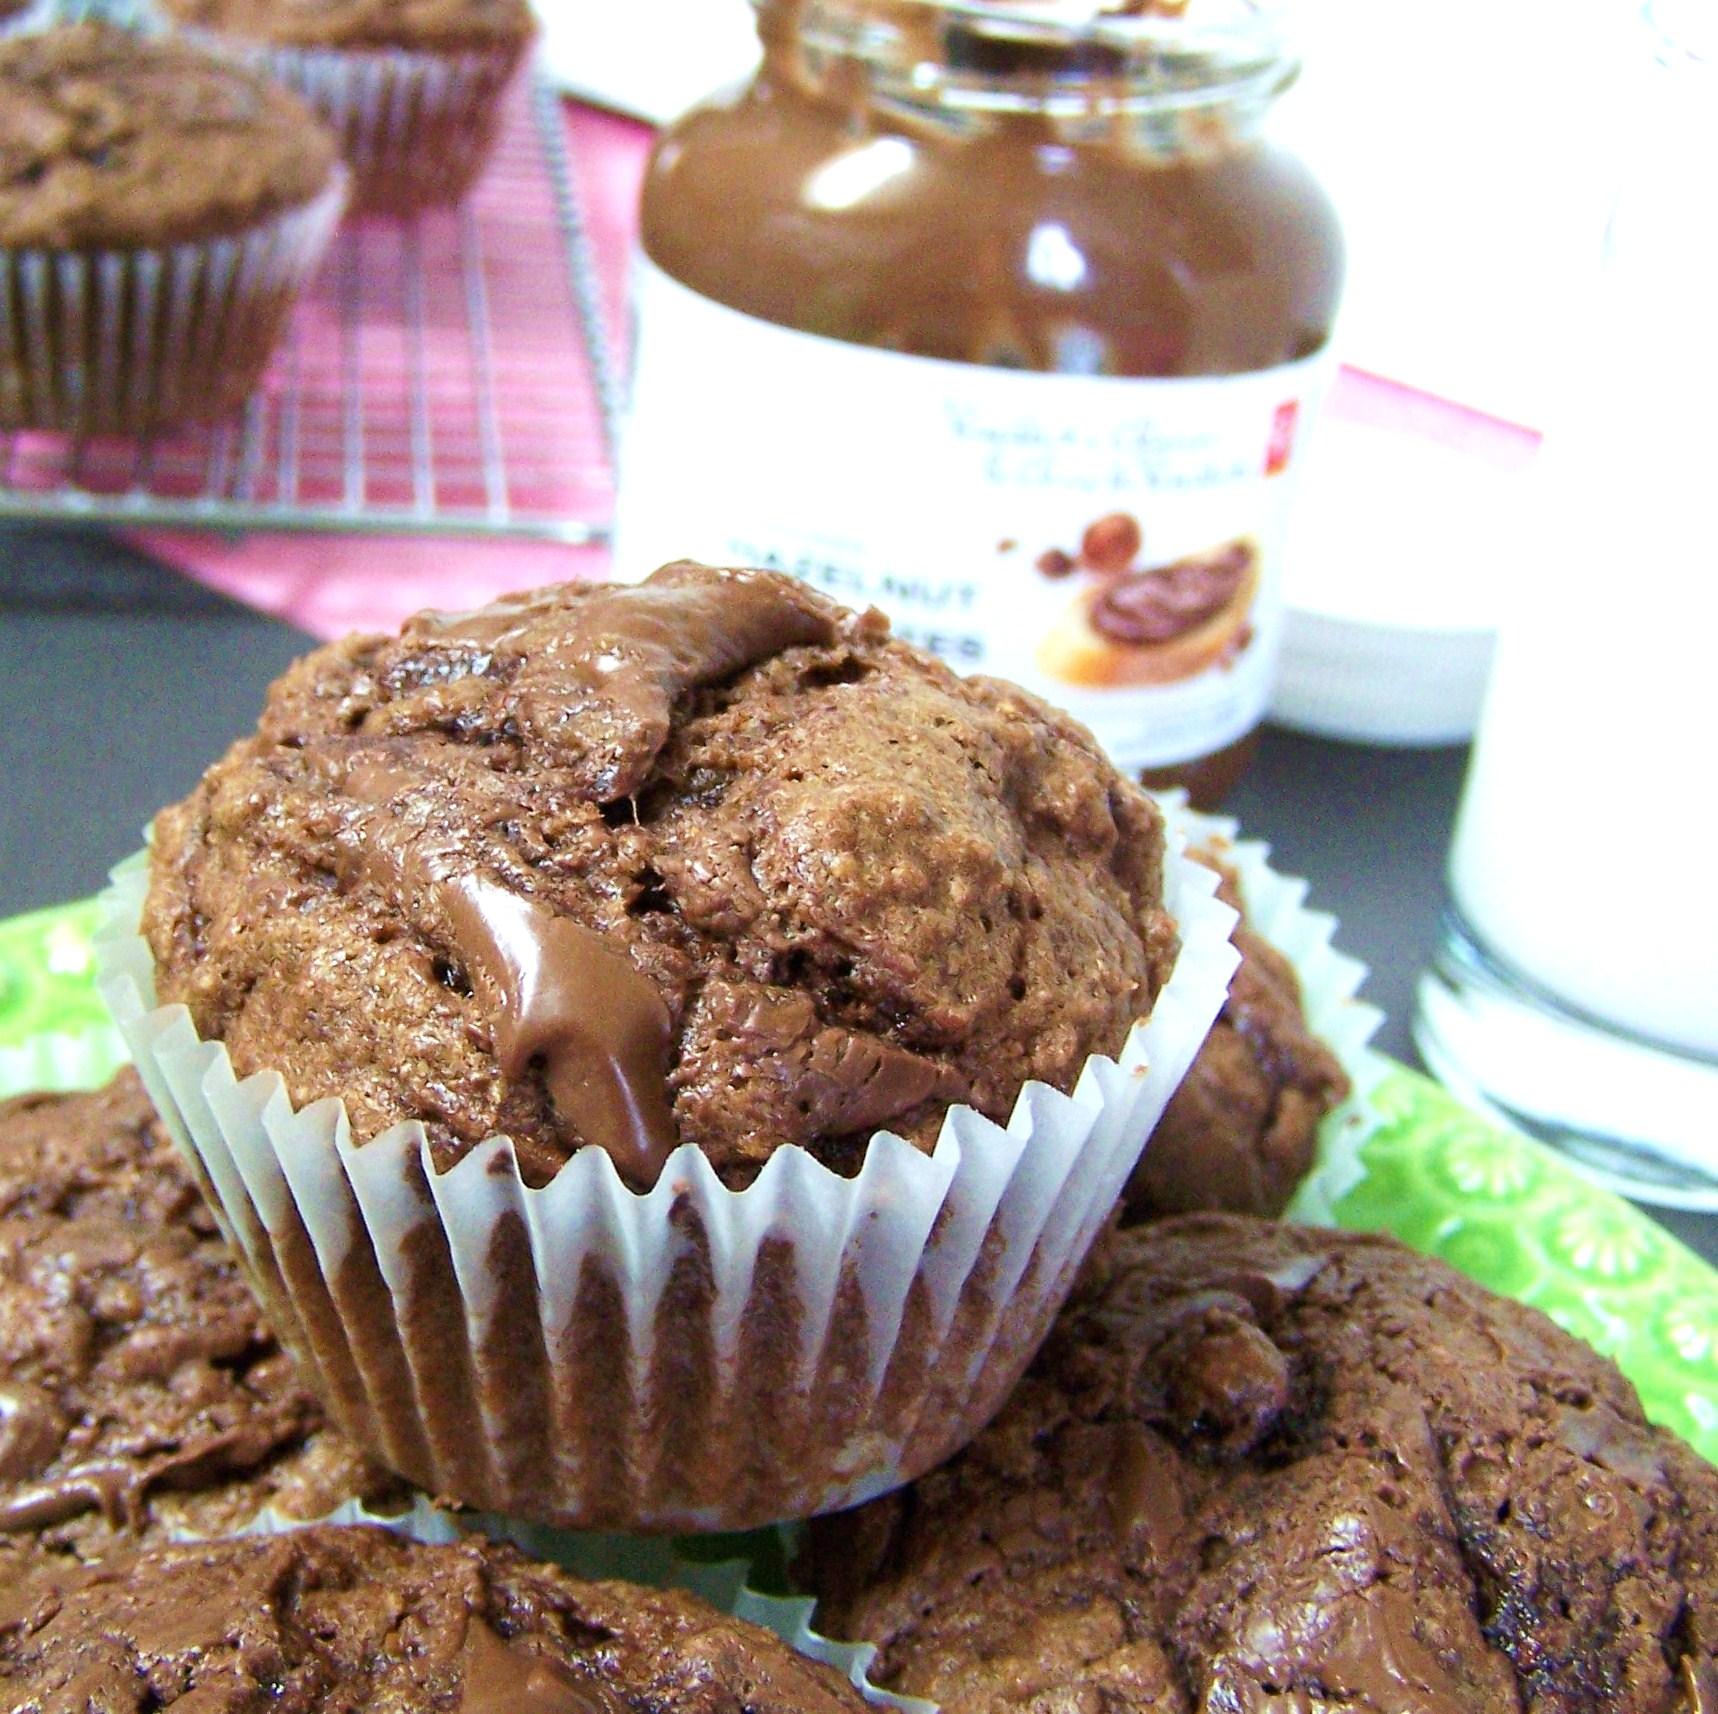 cupcake nutella swirl muffins zucchini muffins with nutella which ...